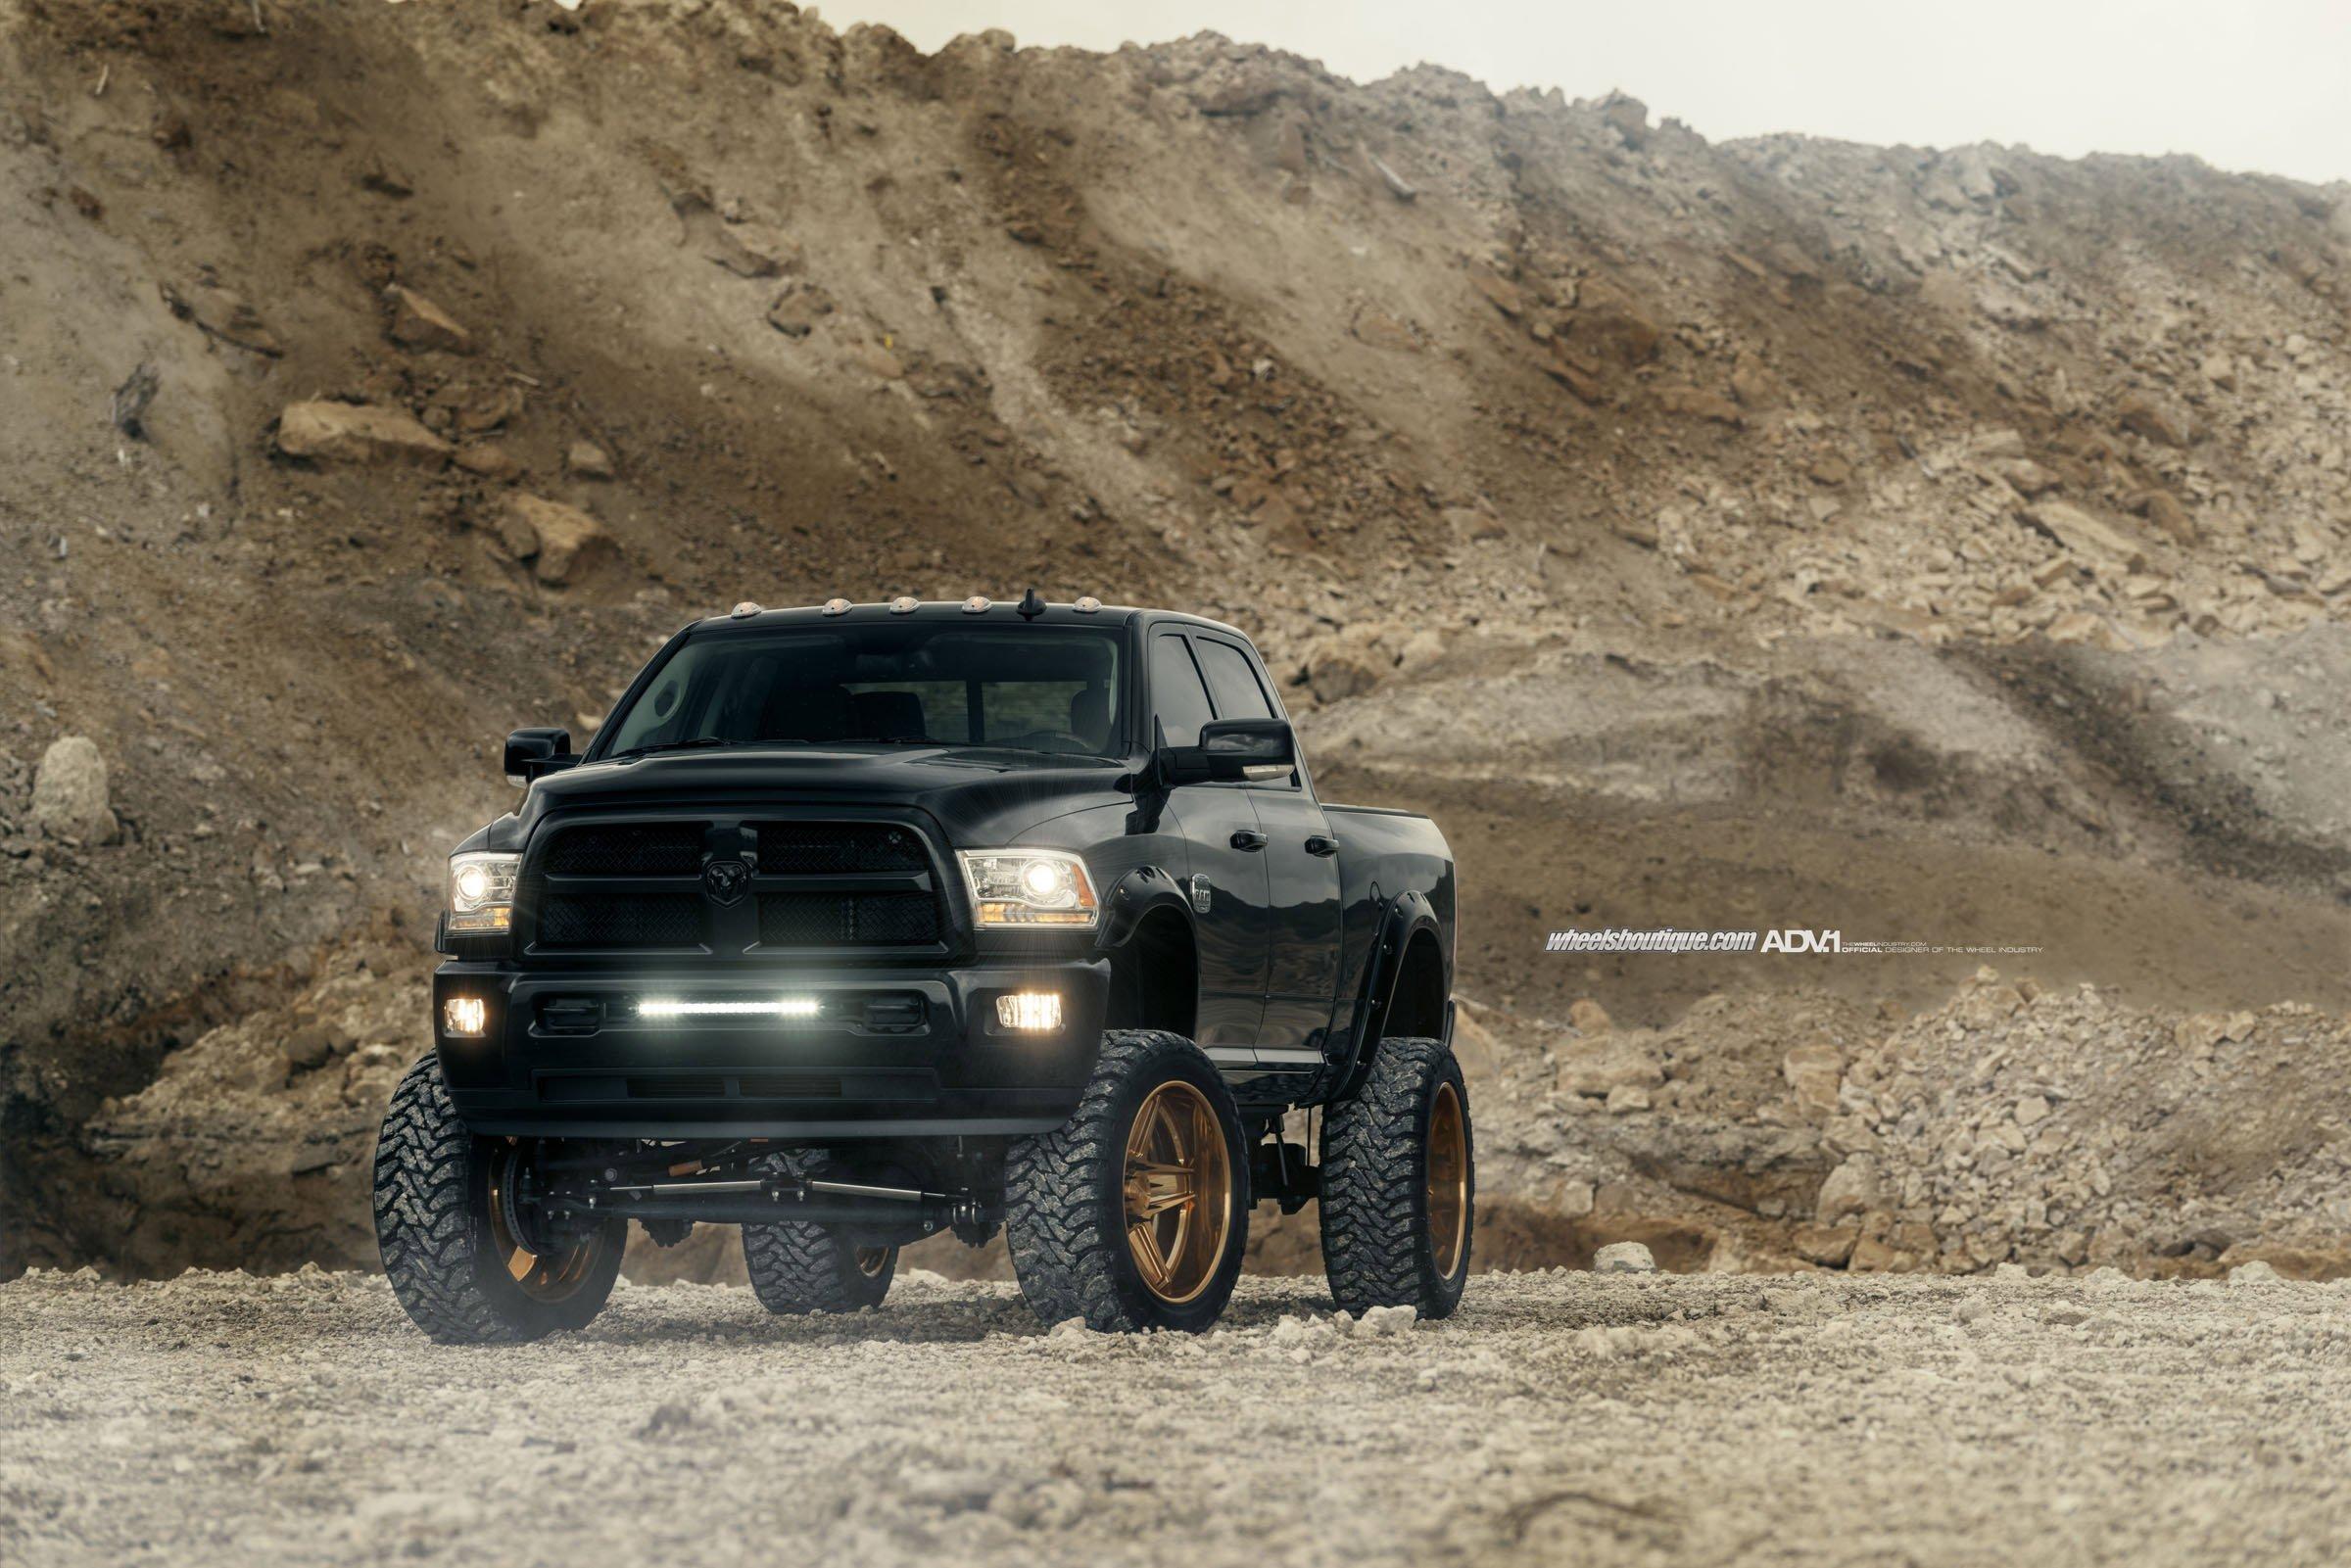 Adv 1 Wheels Gallery Dodge Ram 2500 Hd Truck Pickup Cars Wallpaper 2400x1601 724306 Wallpaperup